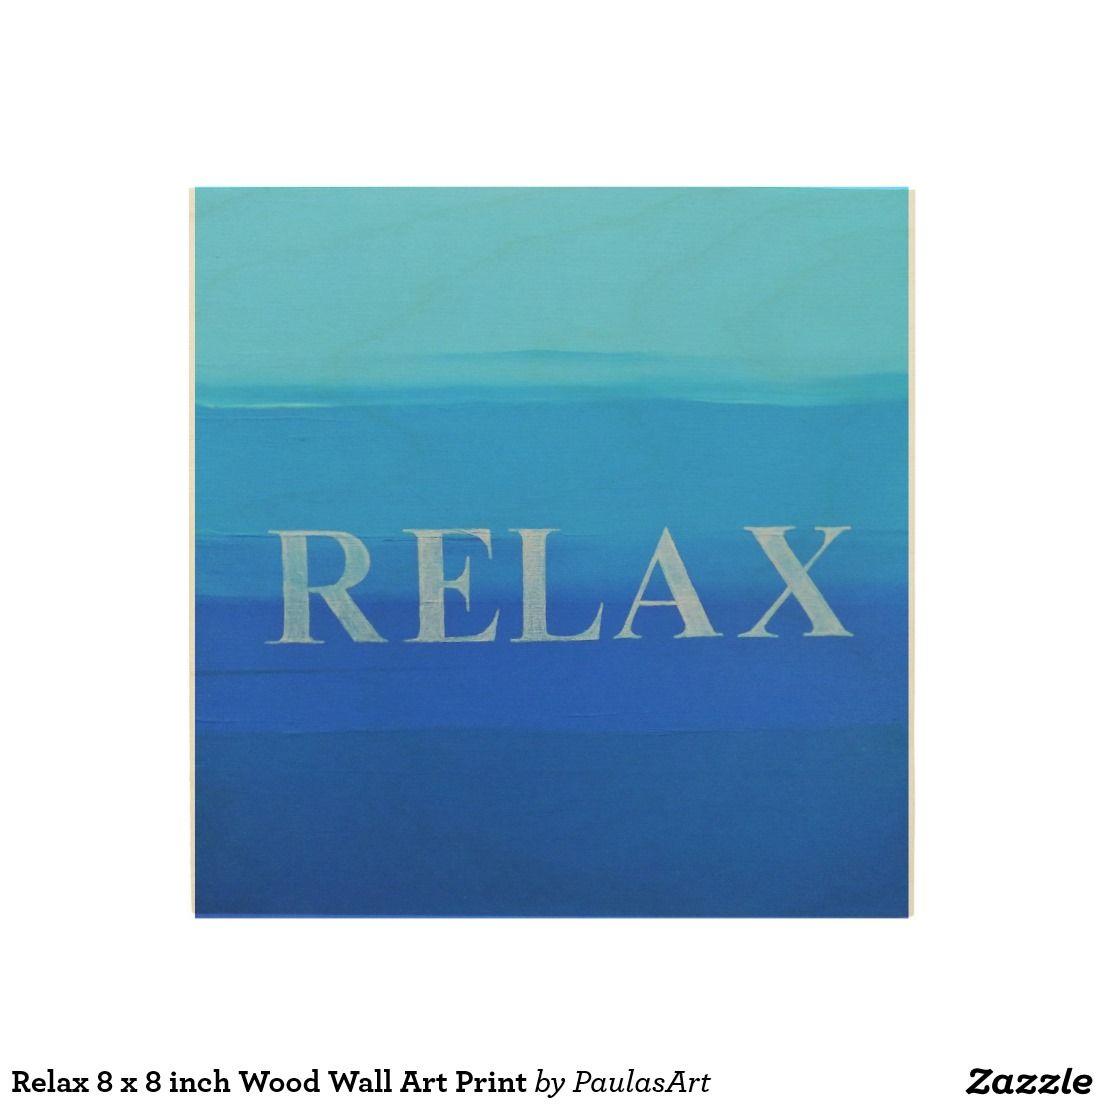 Relax 8 x 8 inch wood wall art print wall